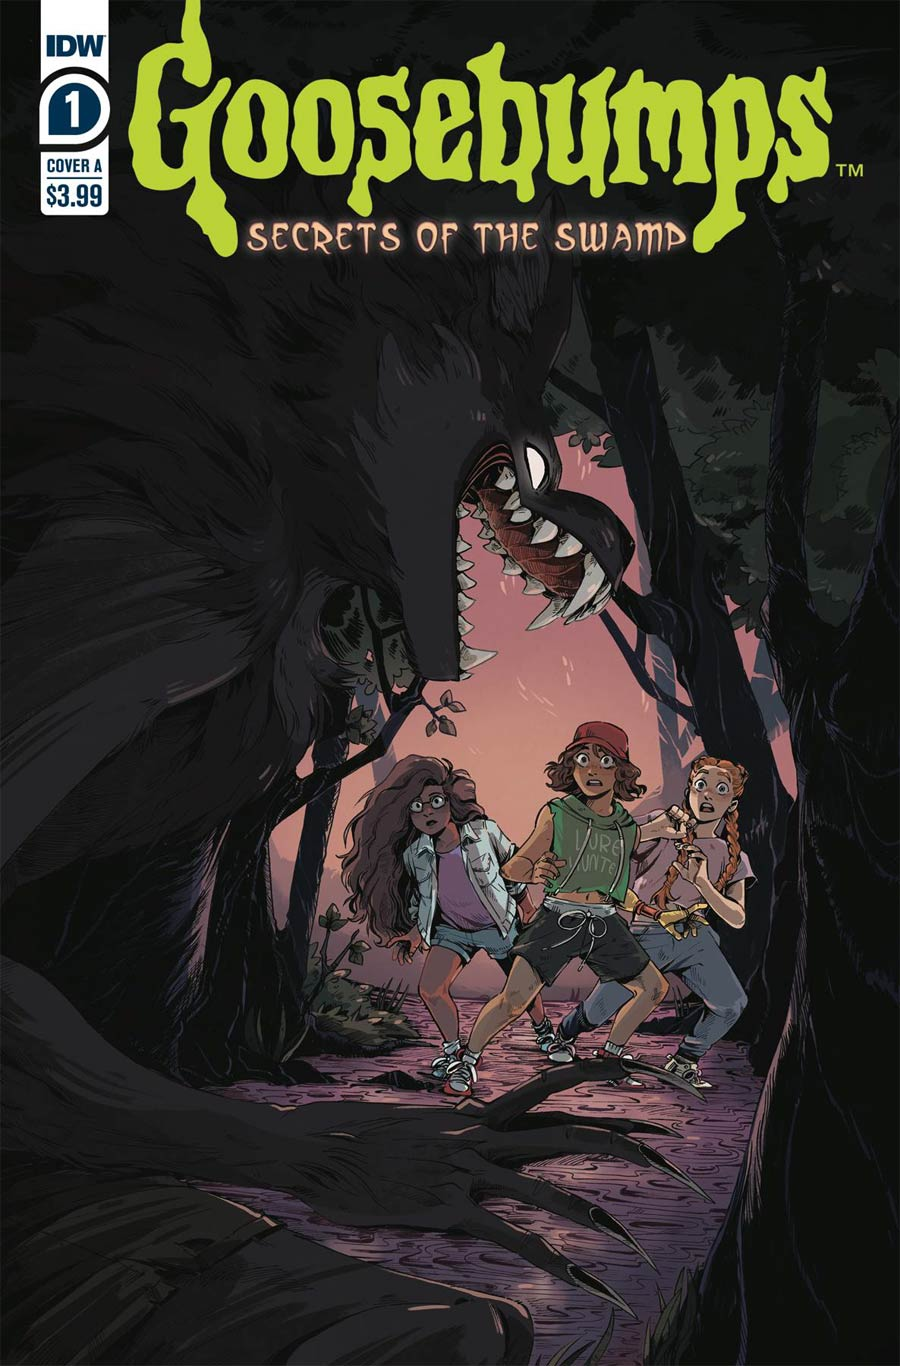 Goosebumps: Secret Of The Swamp #1 (2020)